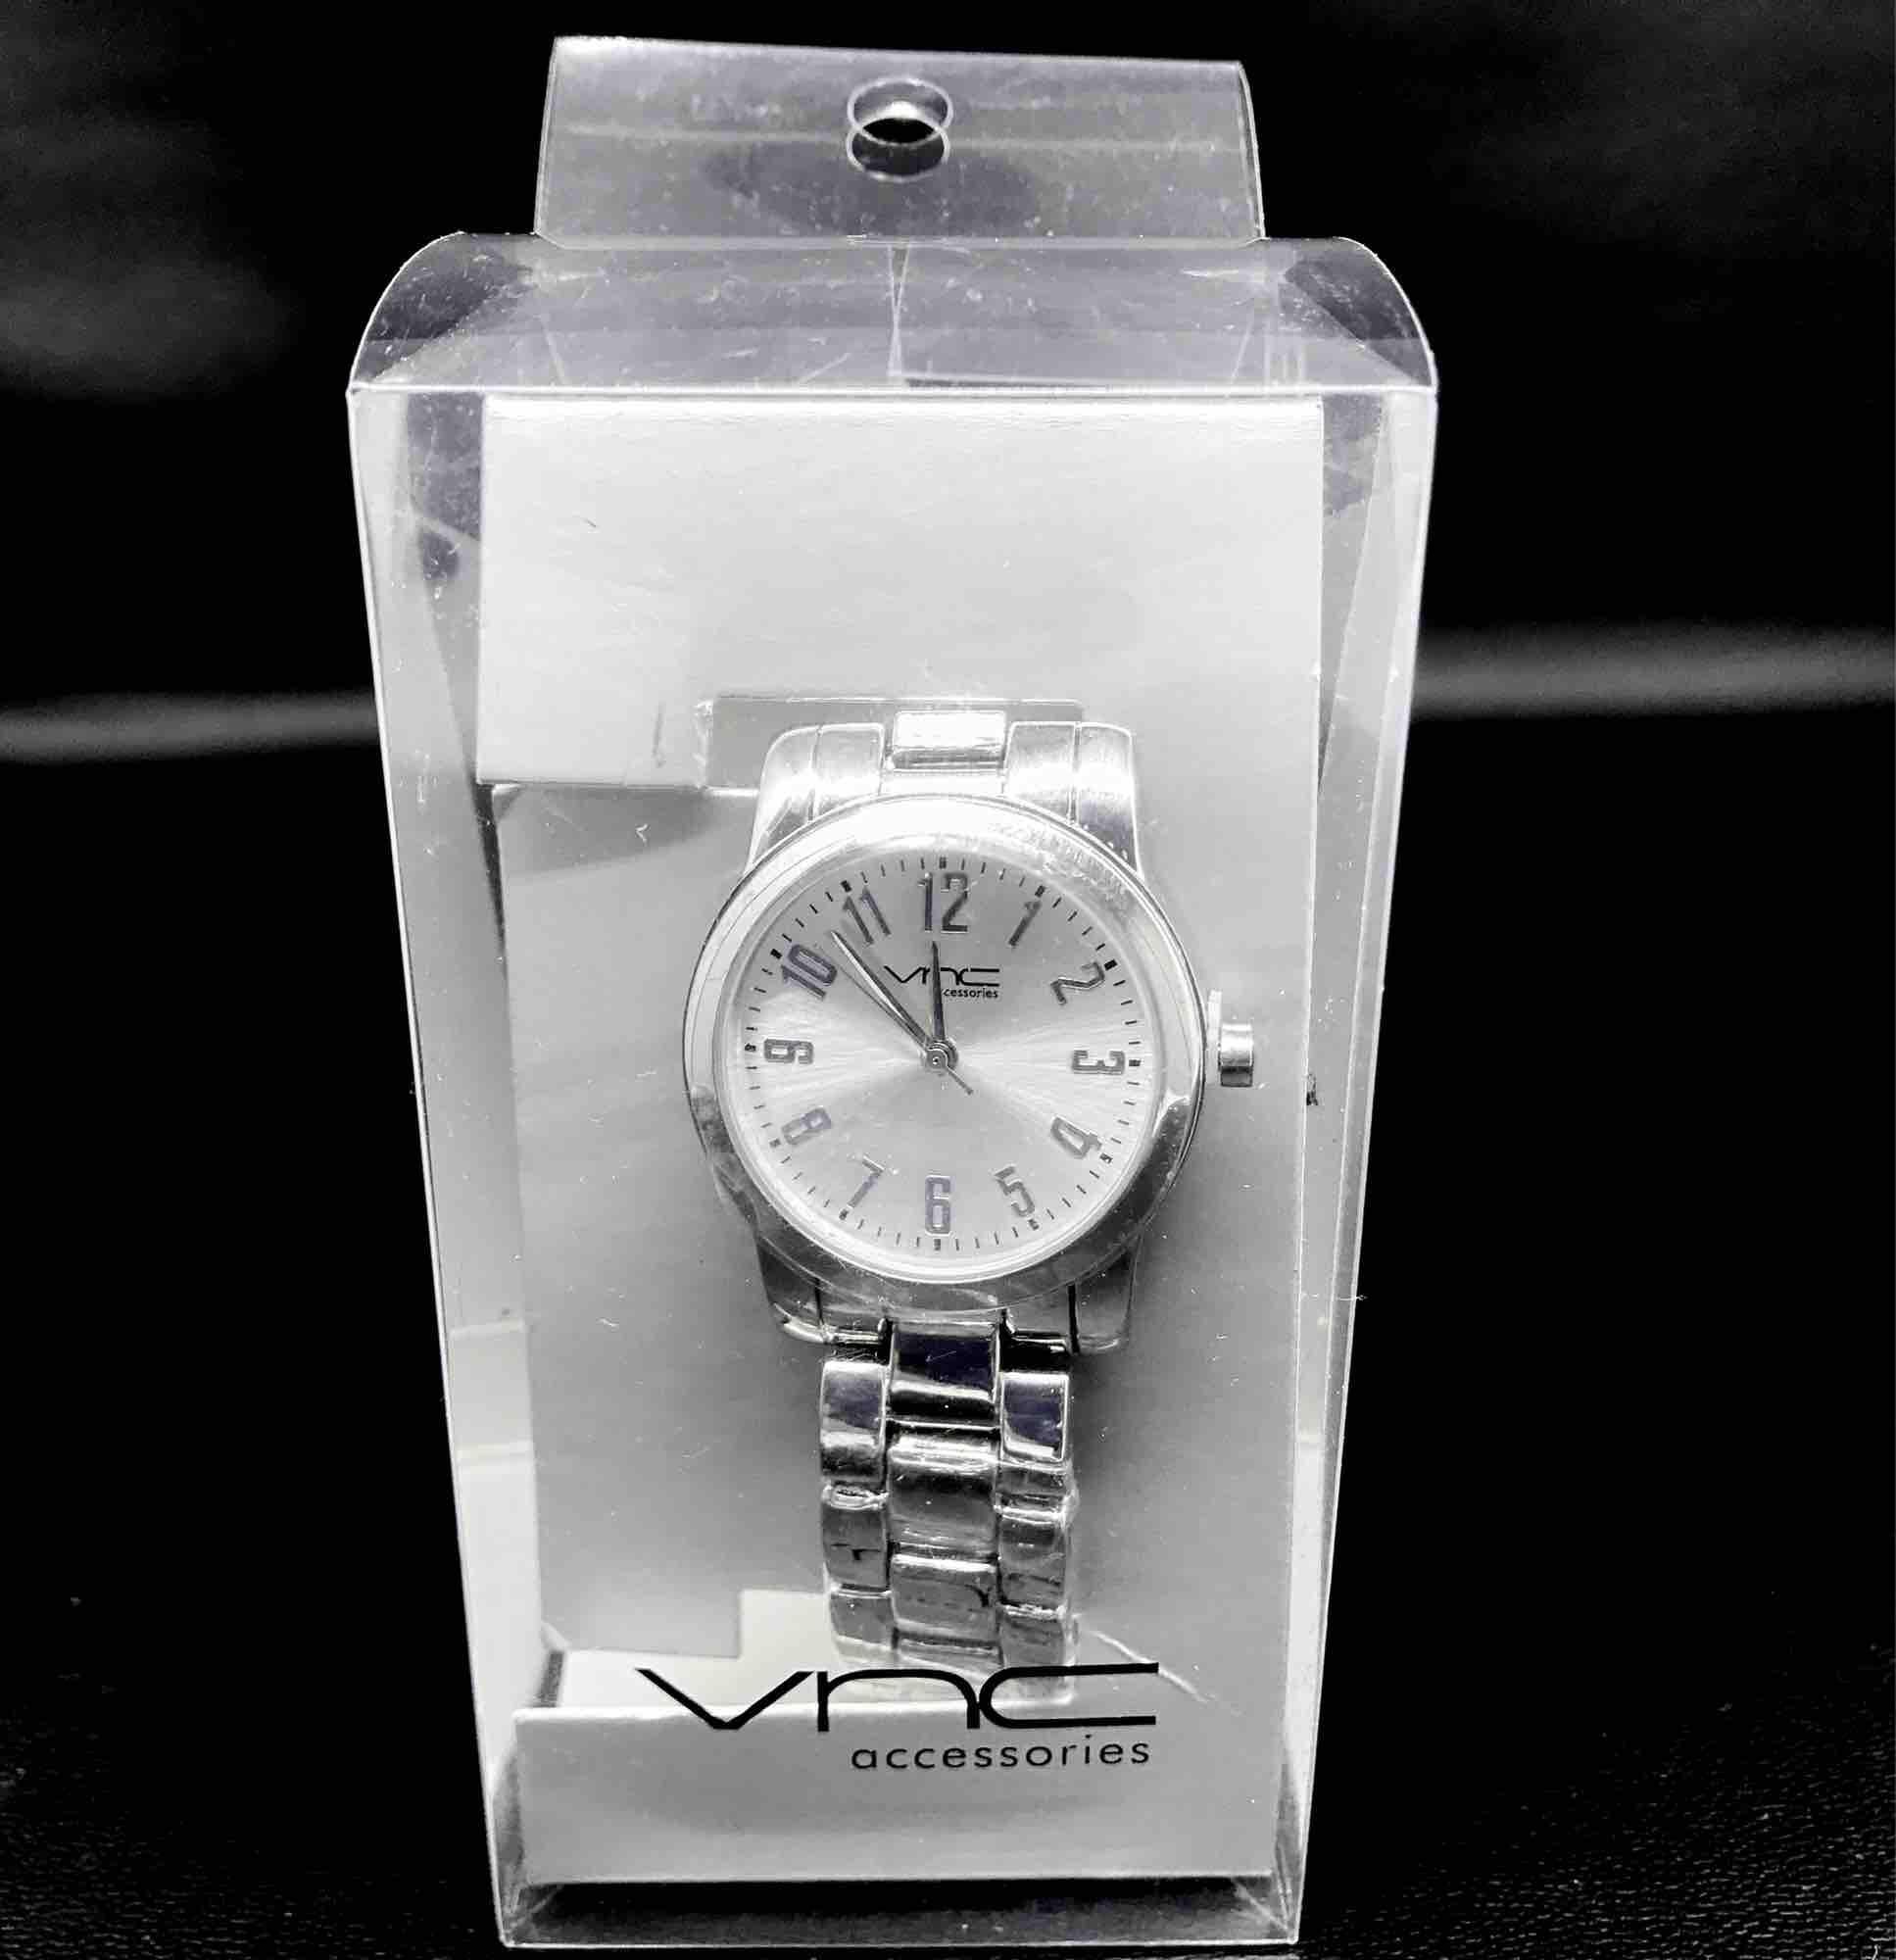 Jam Tangan Vincci VNC Original 100%